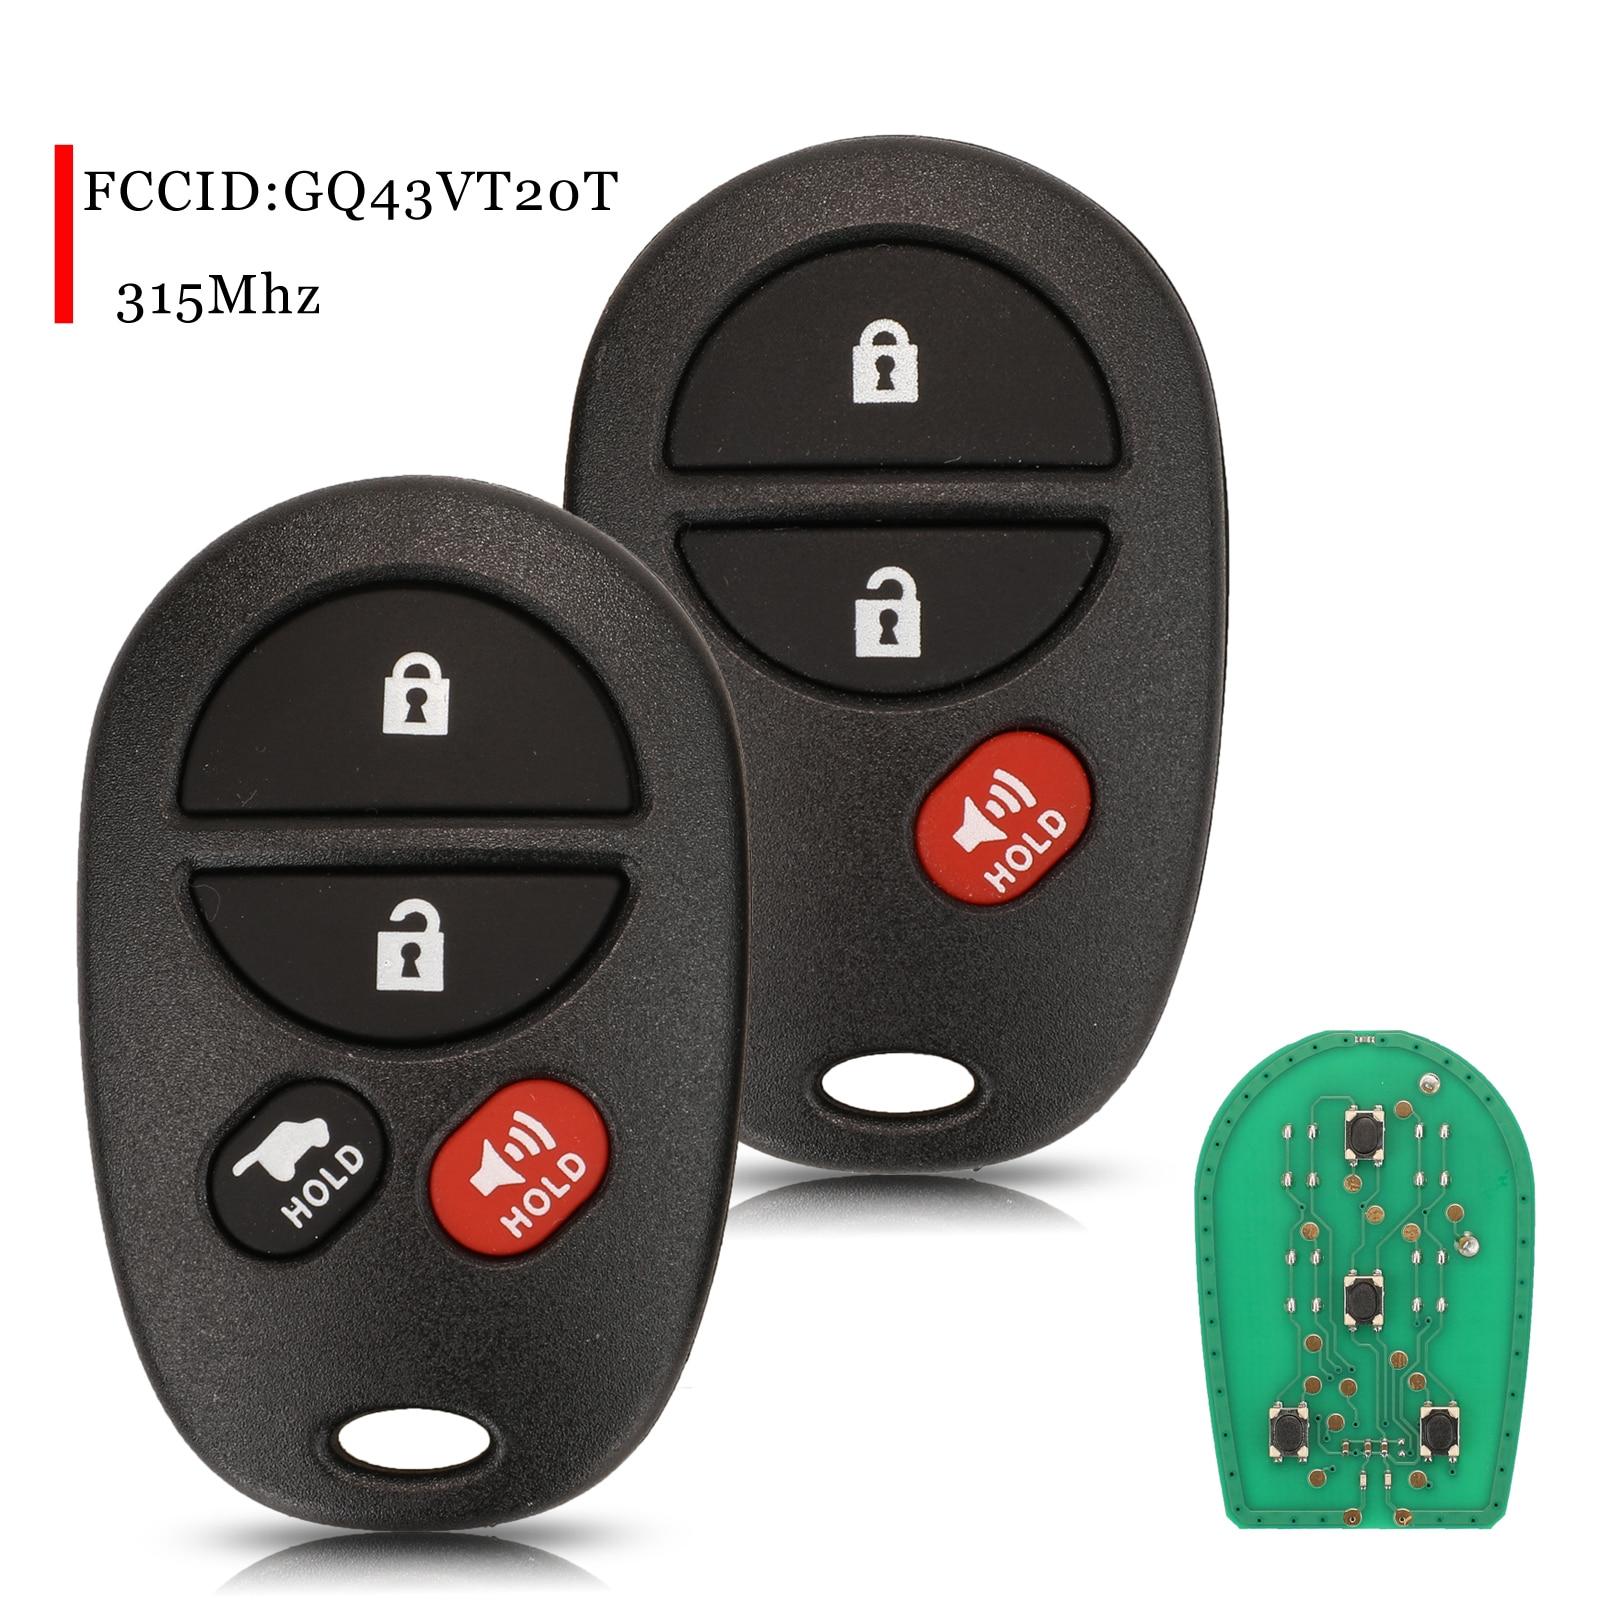 jingyuqin 10pcs For Toyota Tacoma Tundra Highlander Sequoia Sienna 2008-2012 3/4 Buttons Remote Key Fob 315Mhz FCCID:GQ43VT20T